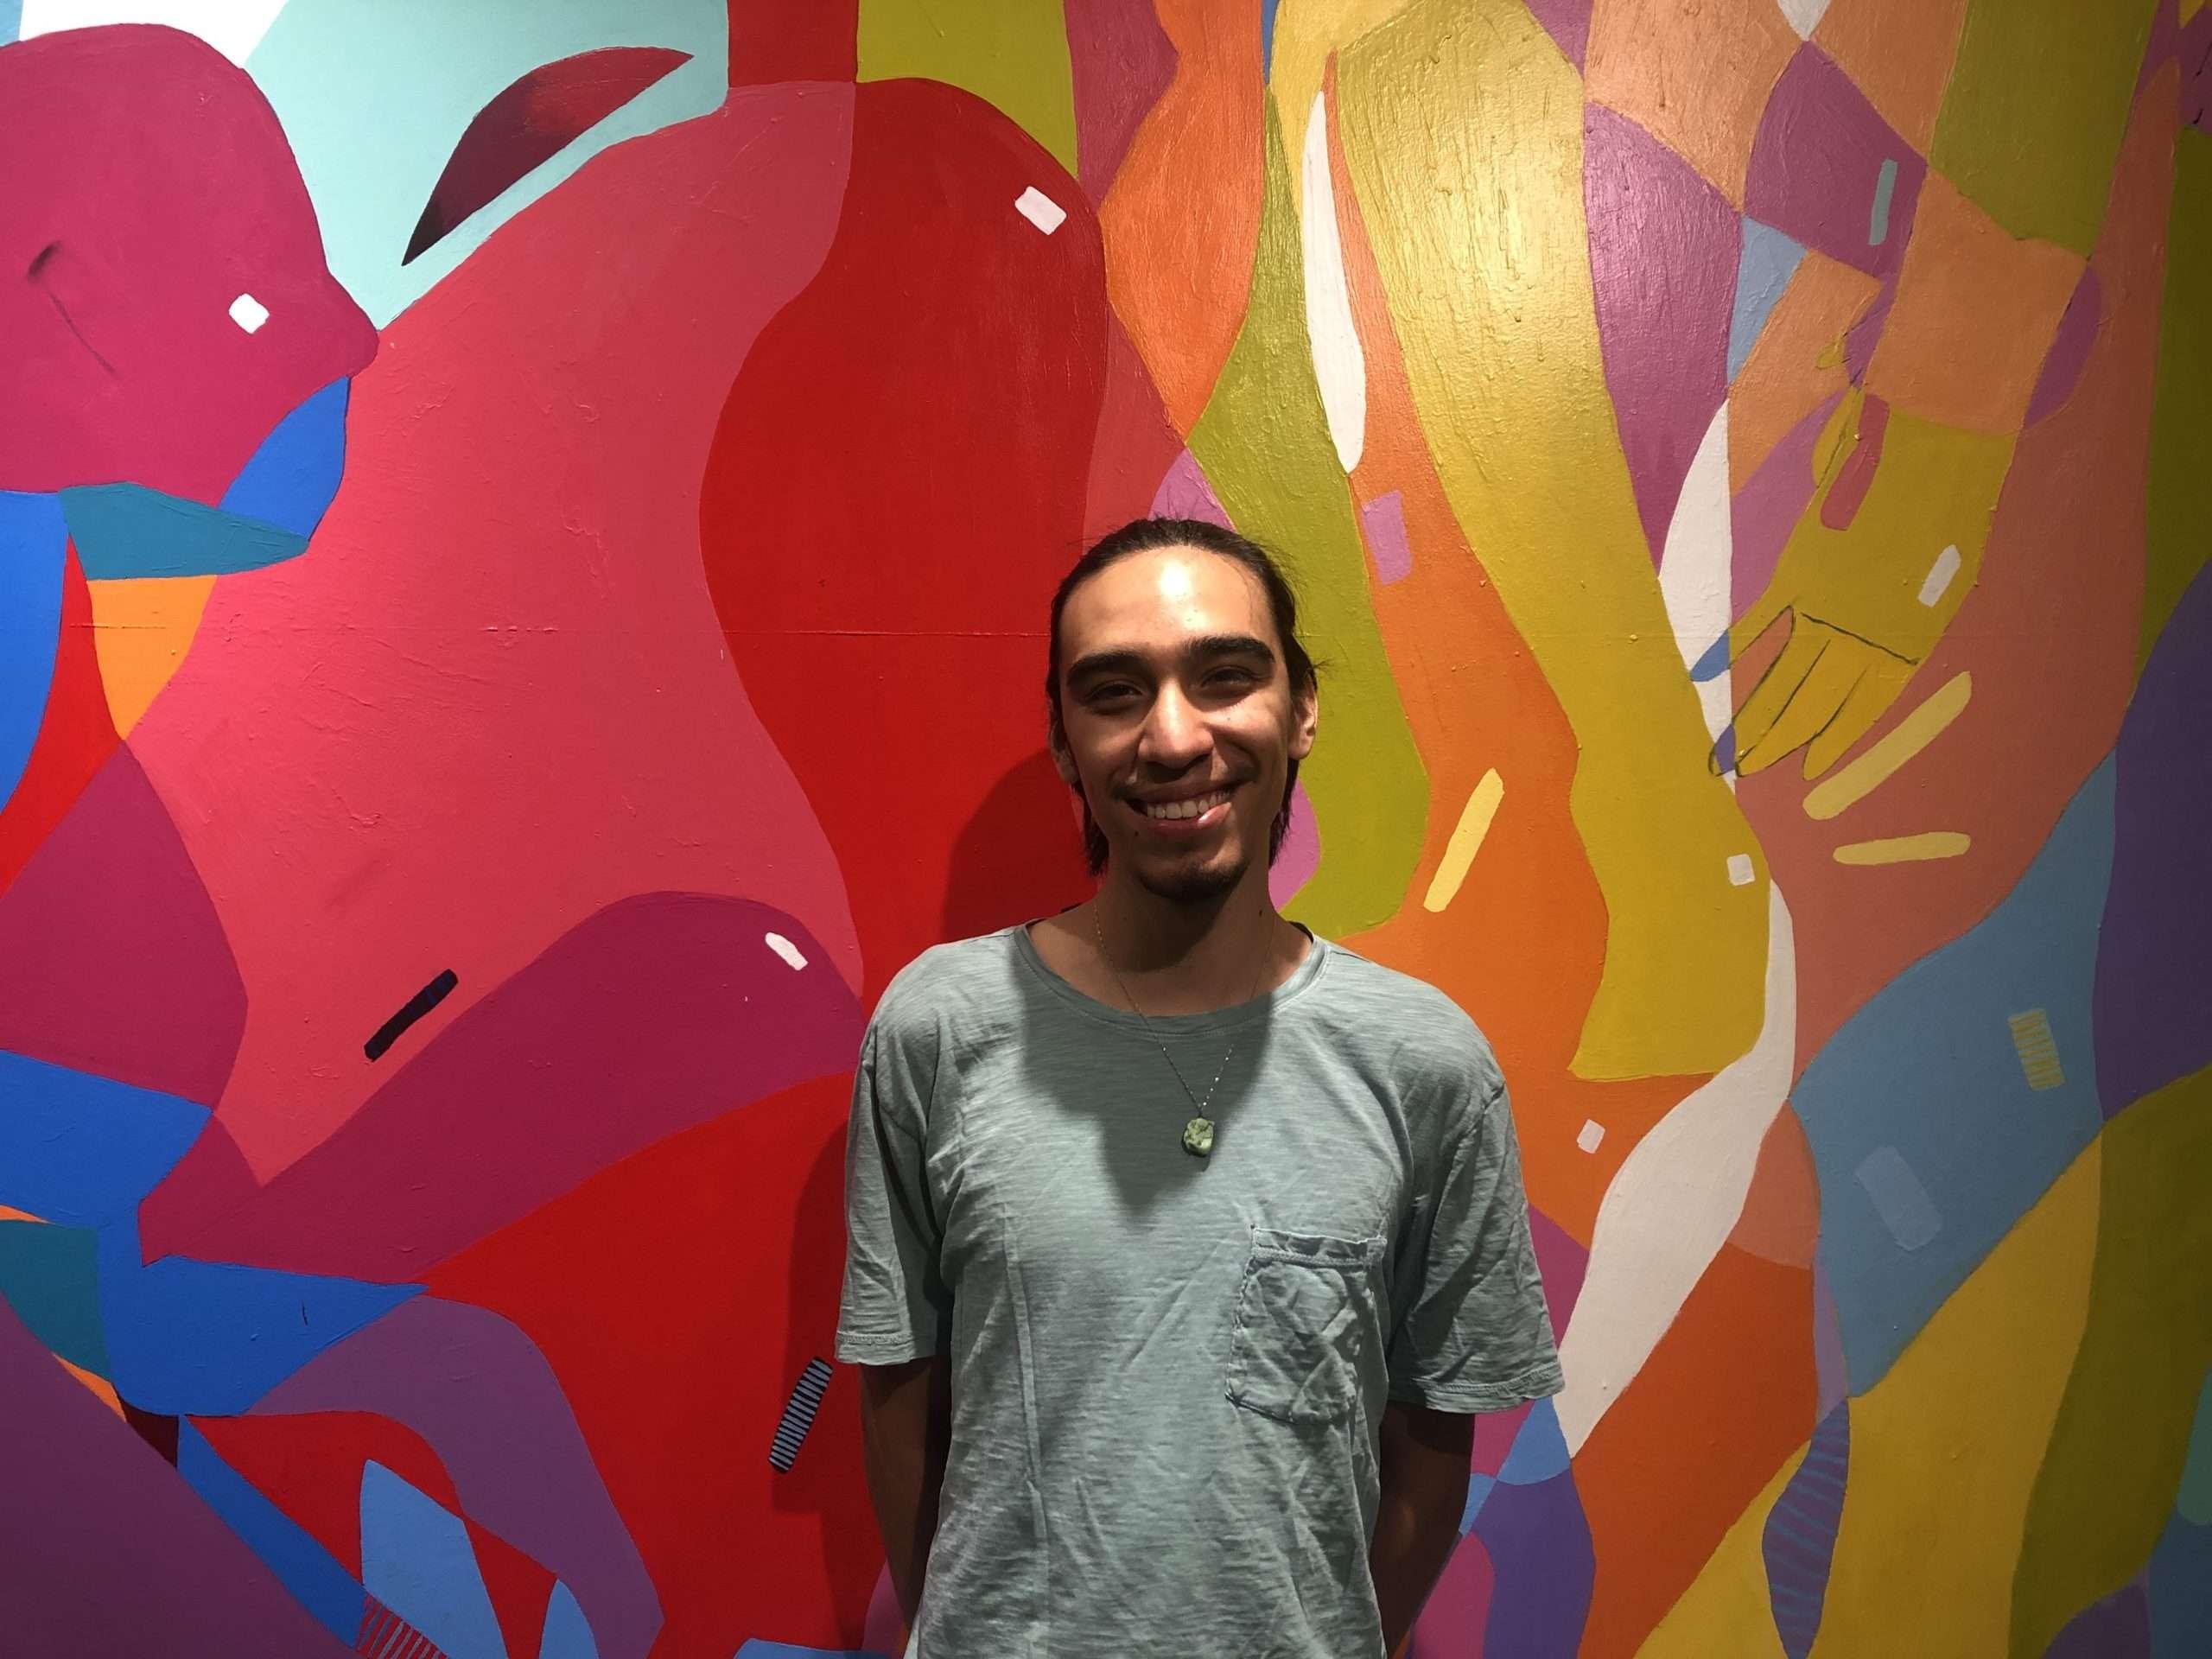 Youth Artist, Tomás Gatica